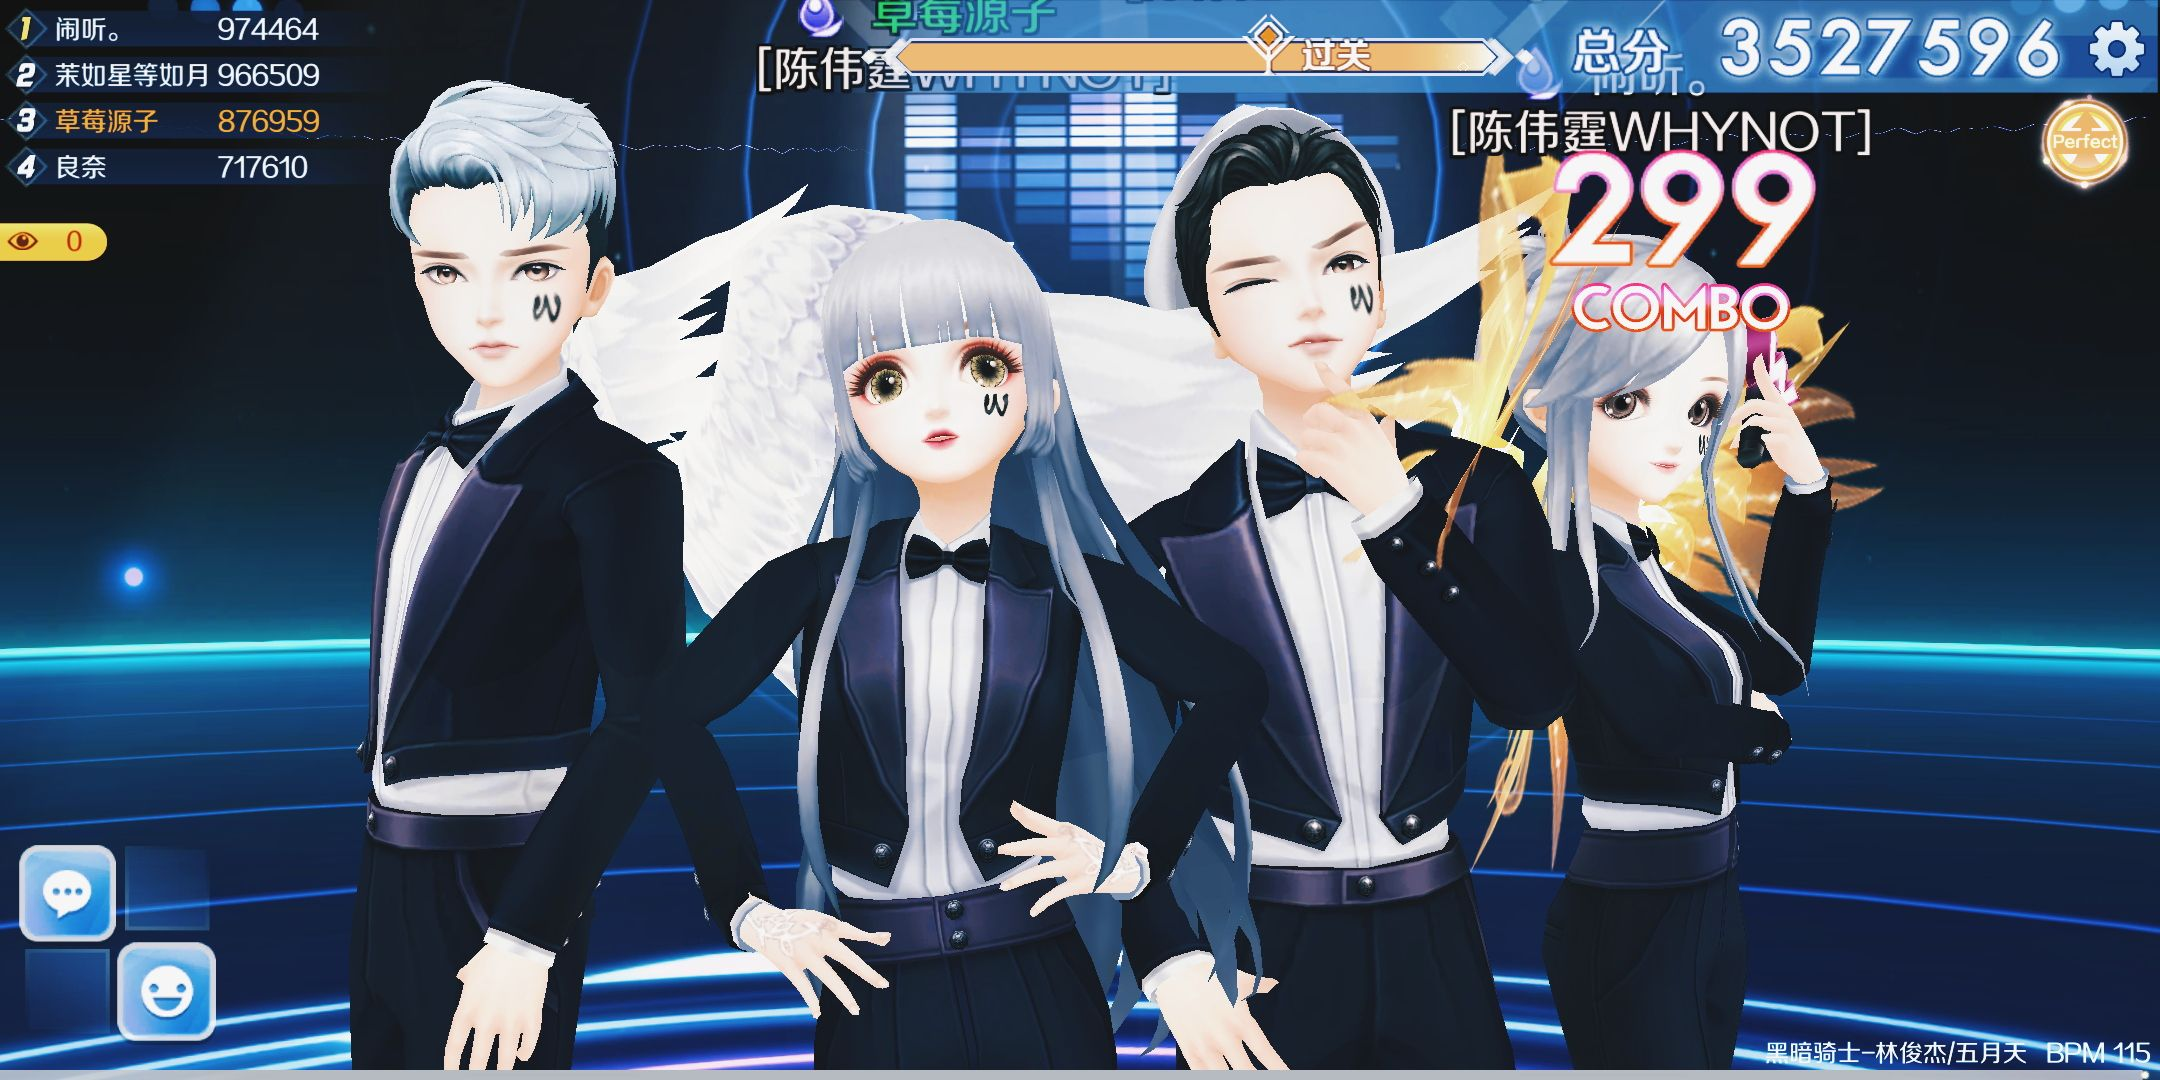 Cool Tencent Qq Dance Mobile Game Screenshots Cr 草莓源子 William Chan 陳偉霆 陈伟霆 ウィリアム チャン 진위정 เฉ นเหว ยถ ง Trần Vỹ Tencent Qq Mobile Game Anime